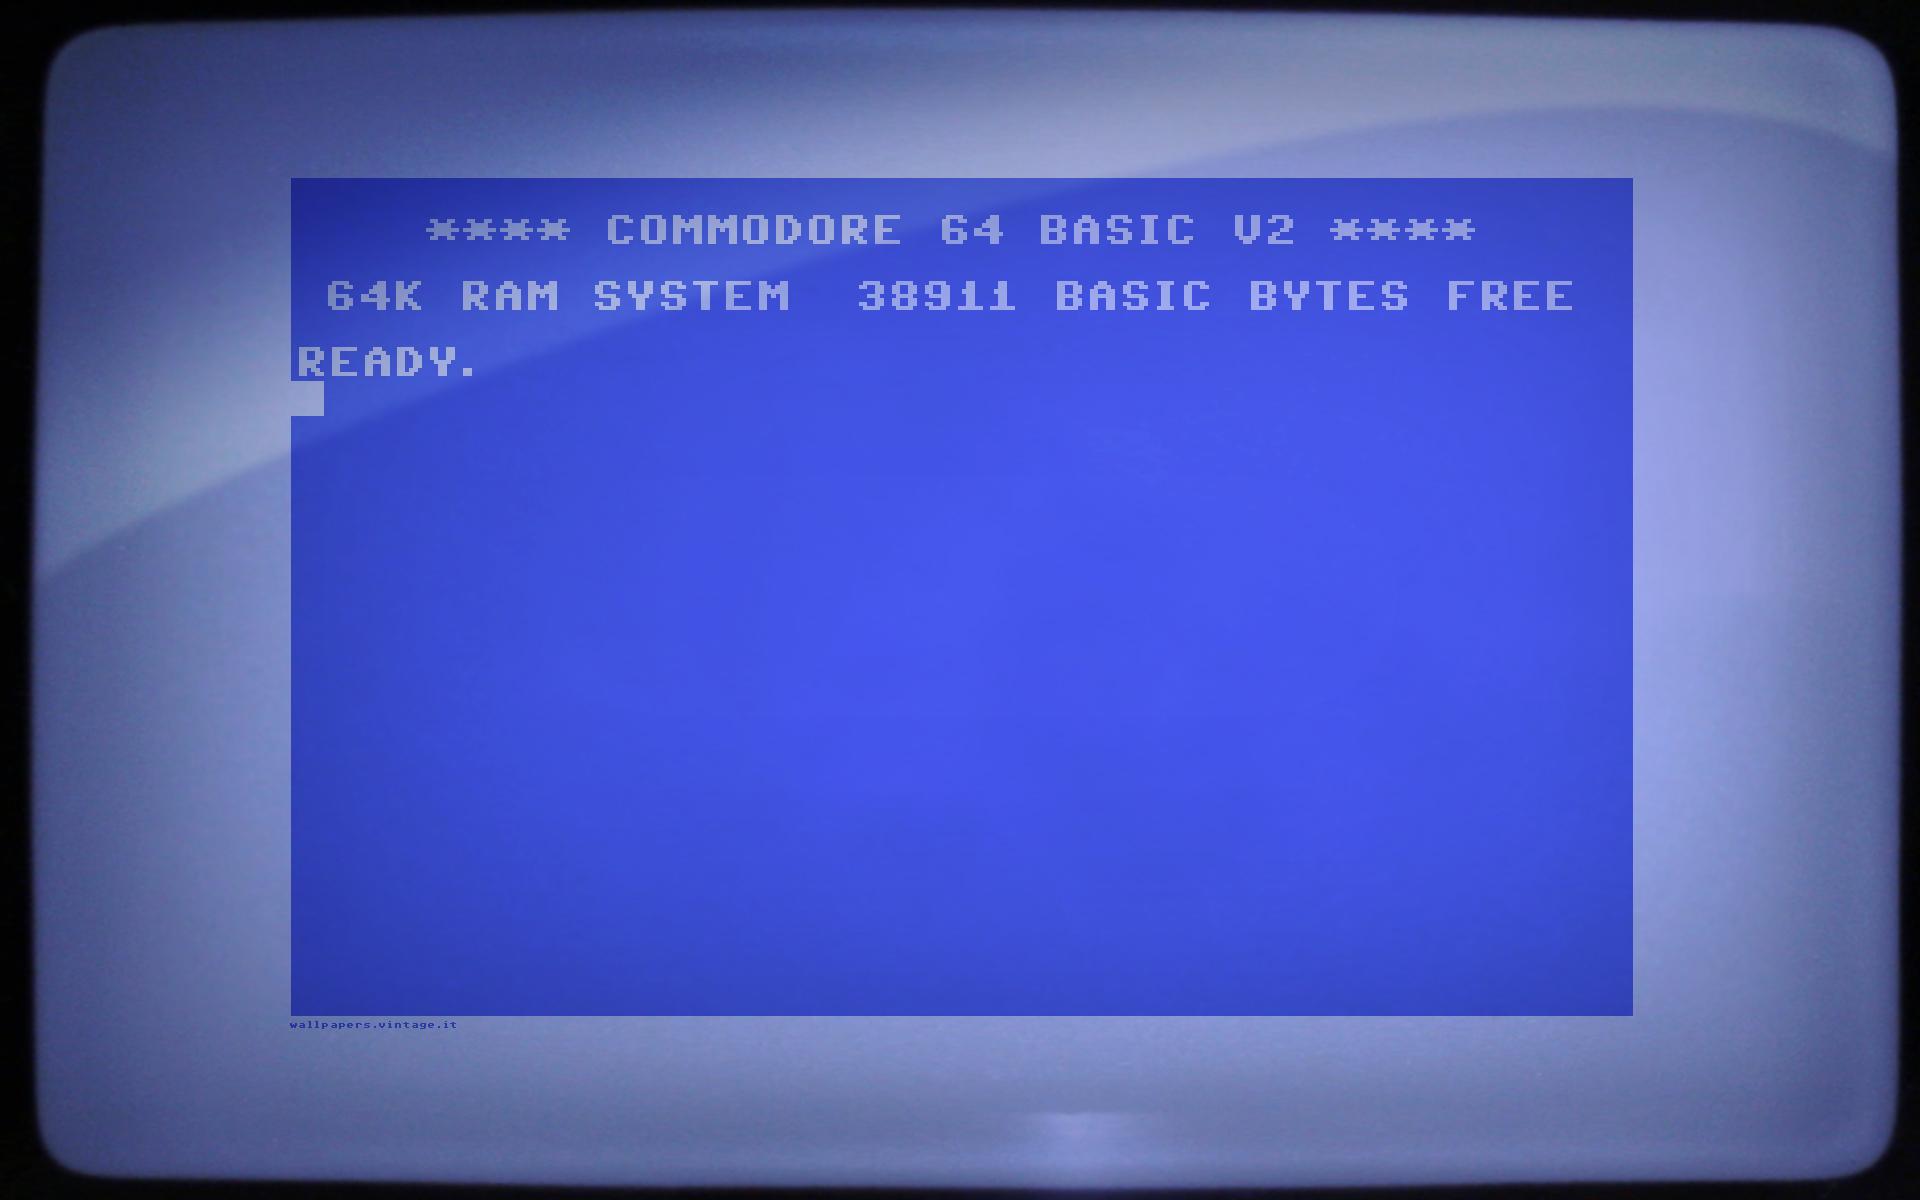 Commodore 64 Prompt wallpaper   Desktop HD iPad iPhone wallpapers 1920x1200